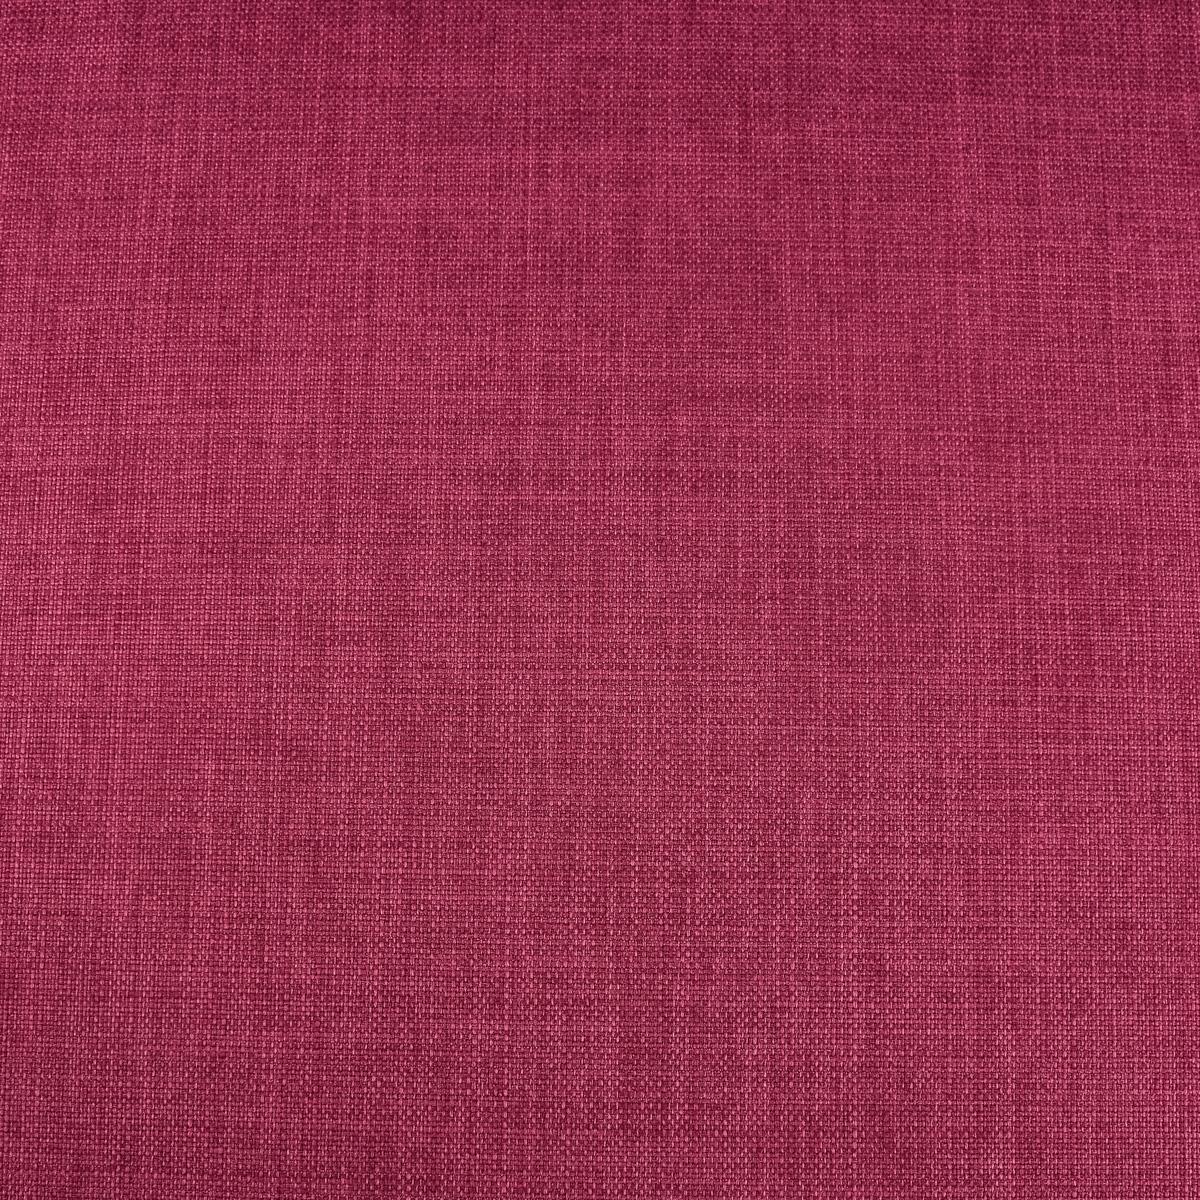 Bezugsstoff Möbelstoff Brooks aubergine beere